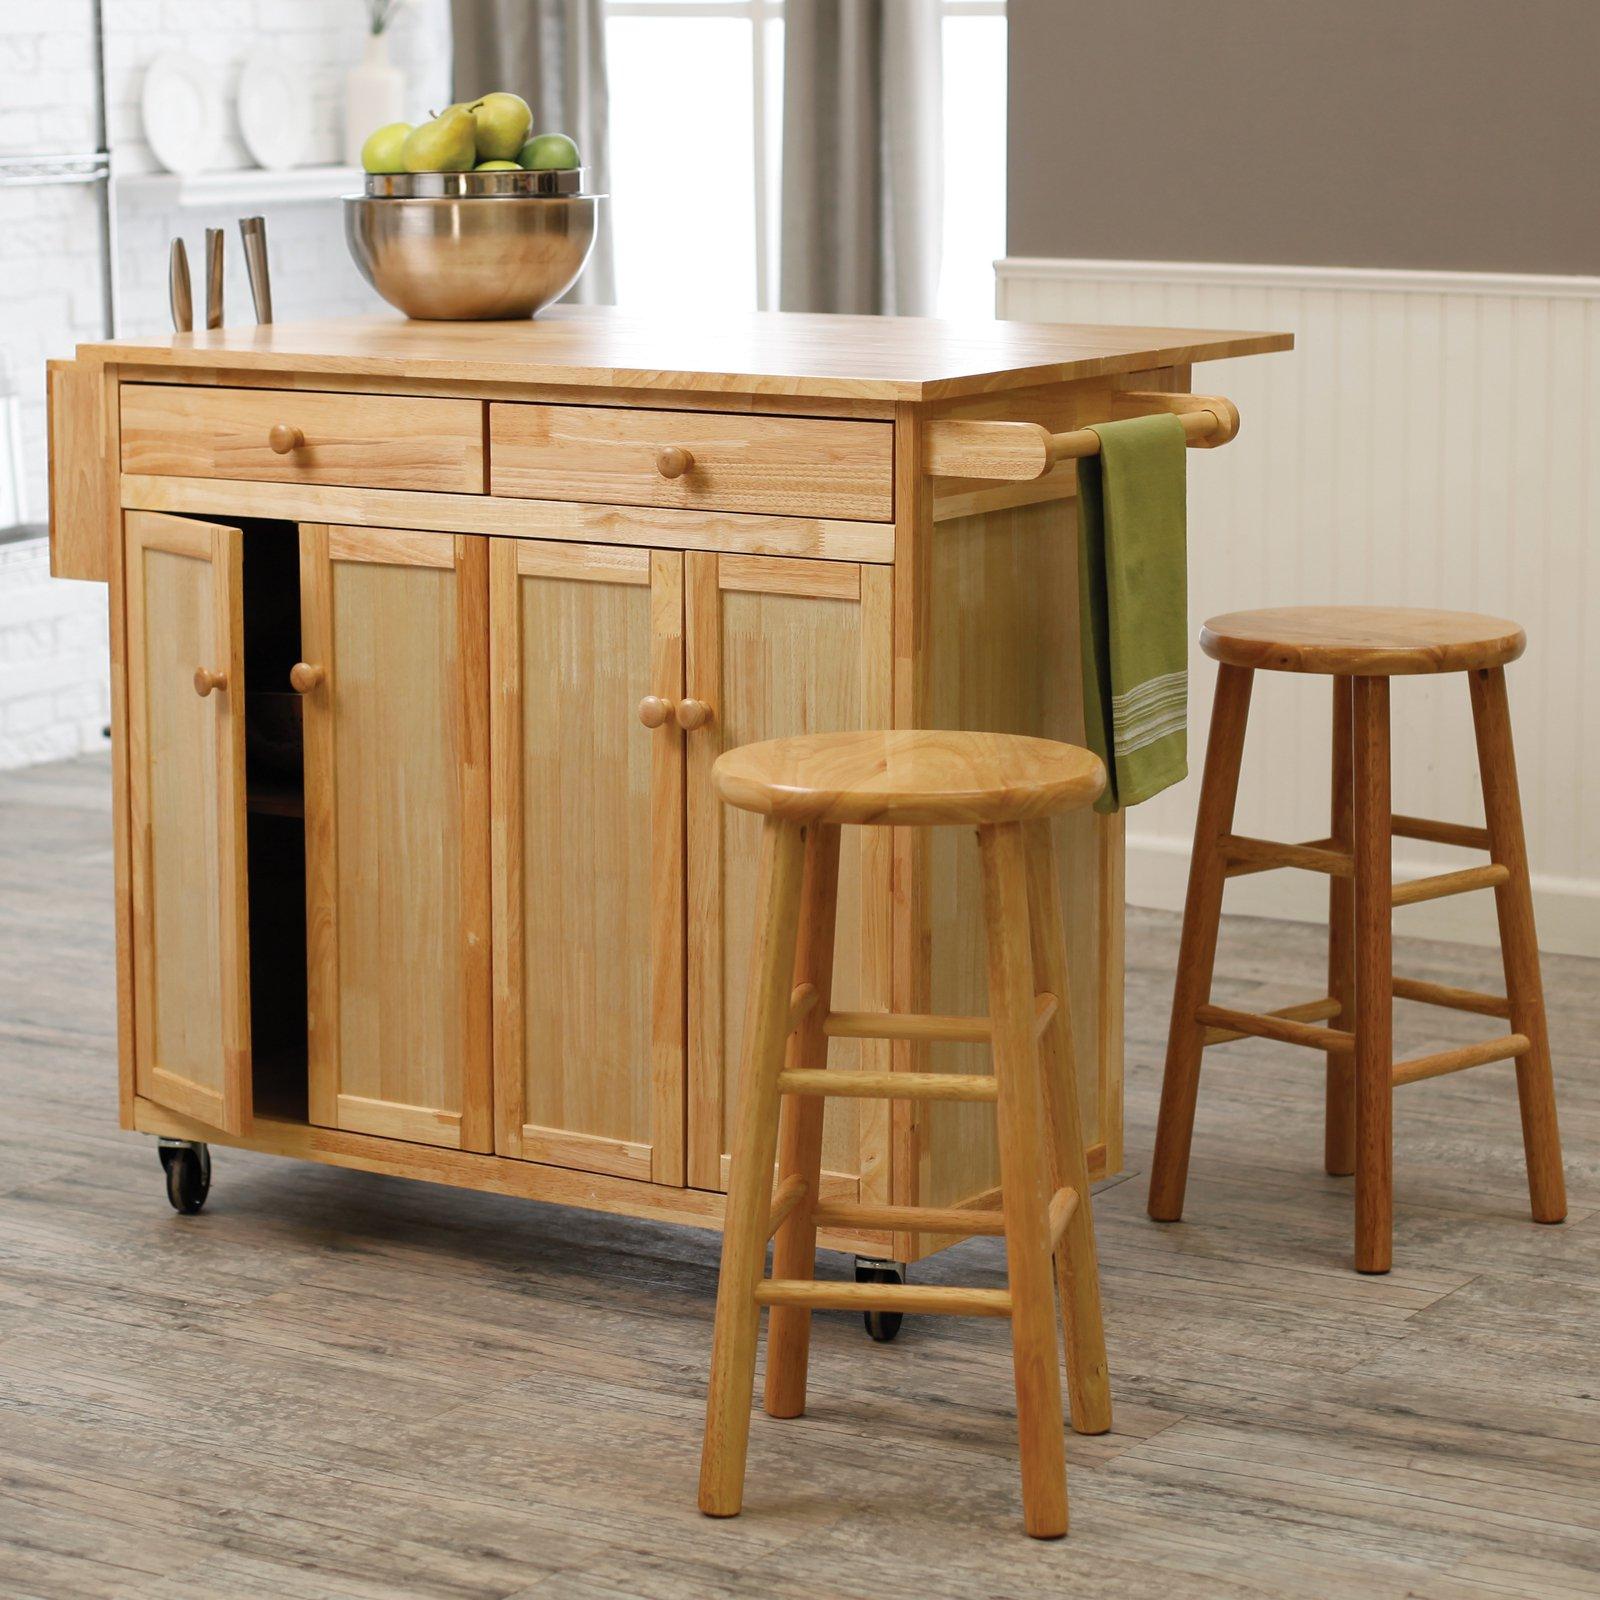 Island kitchen cart photo - 1